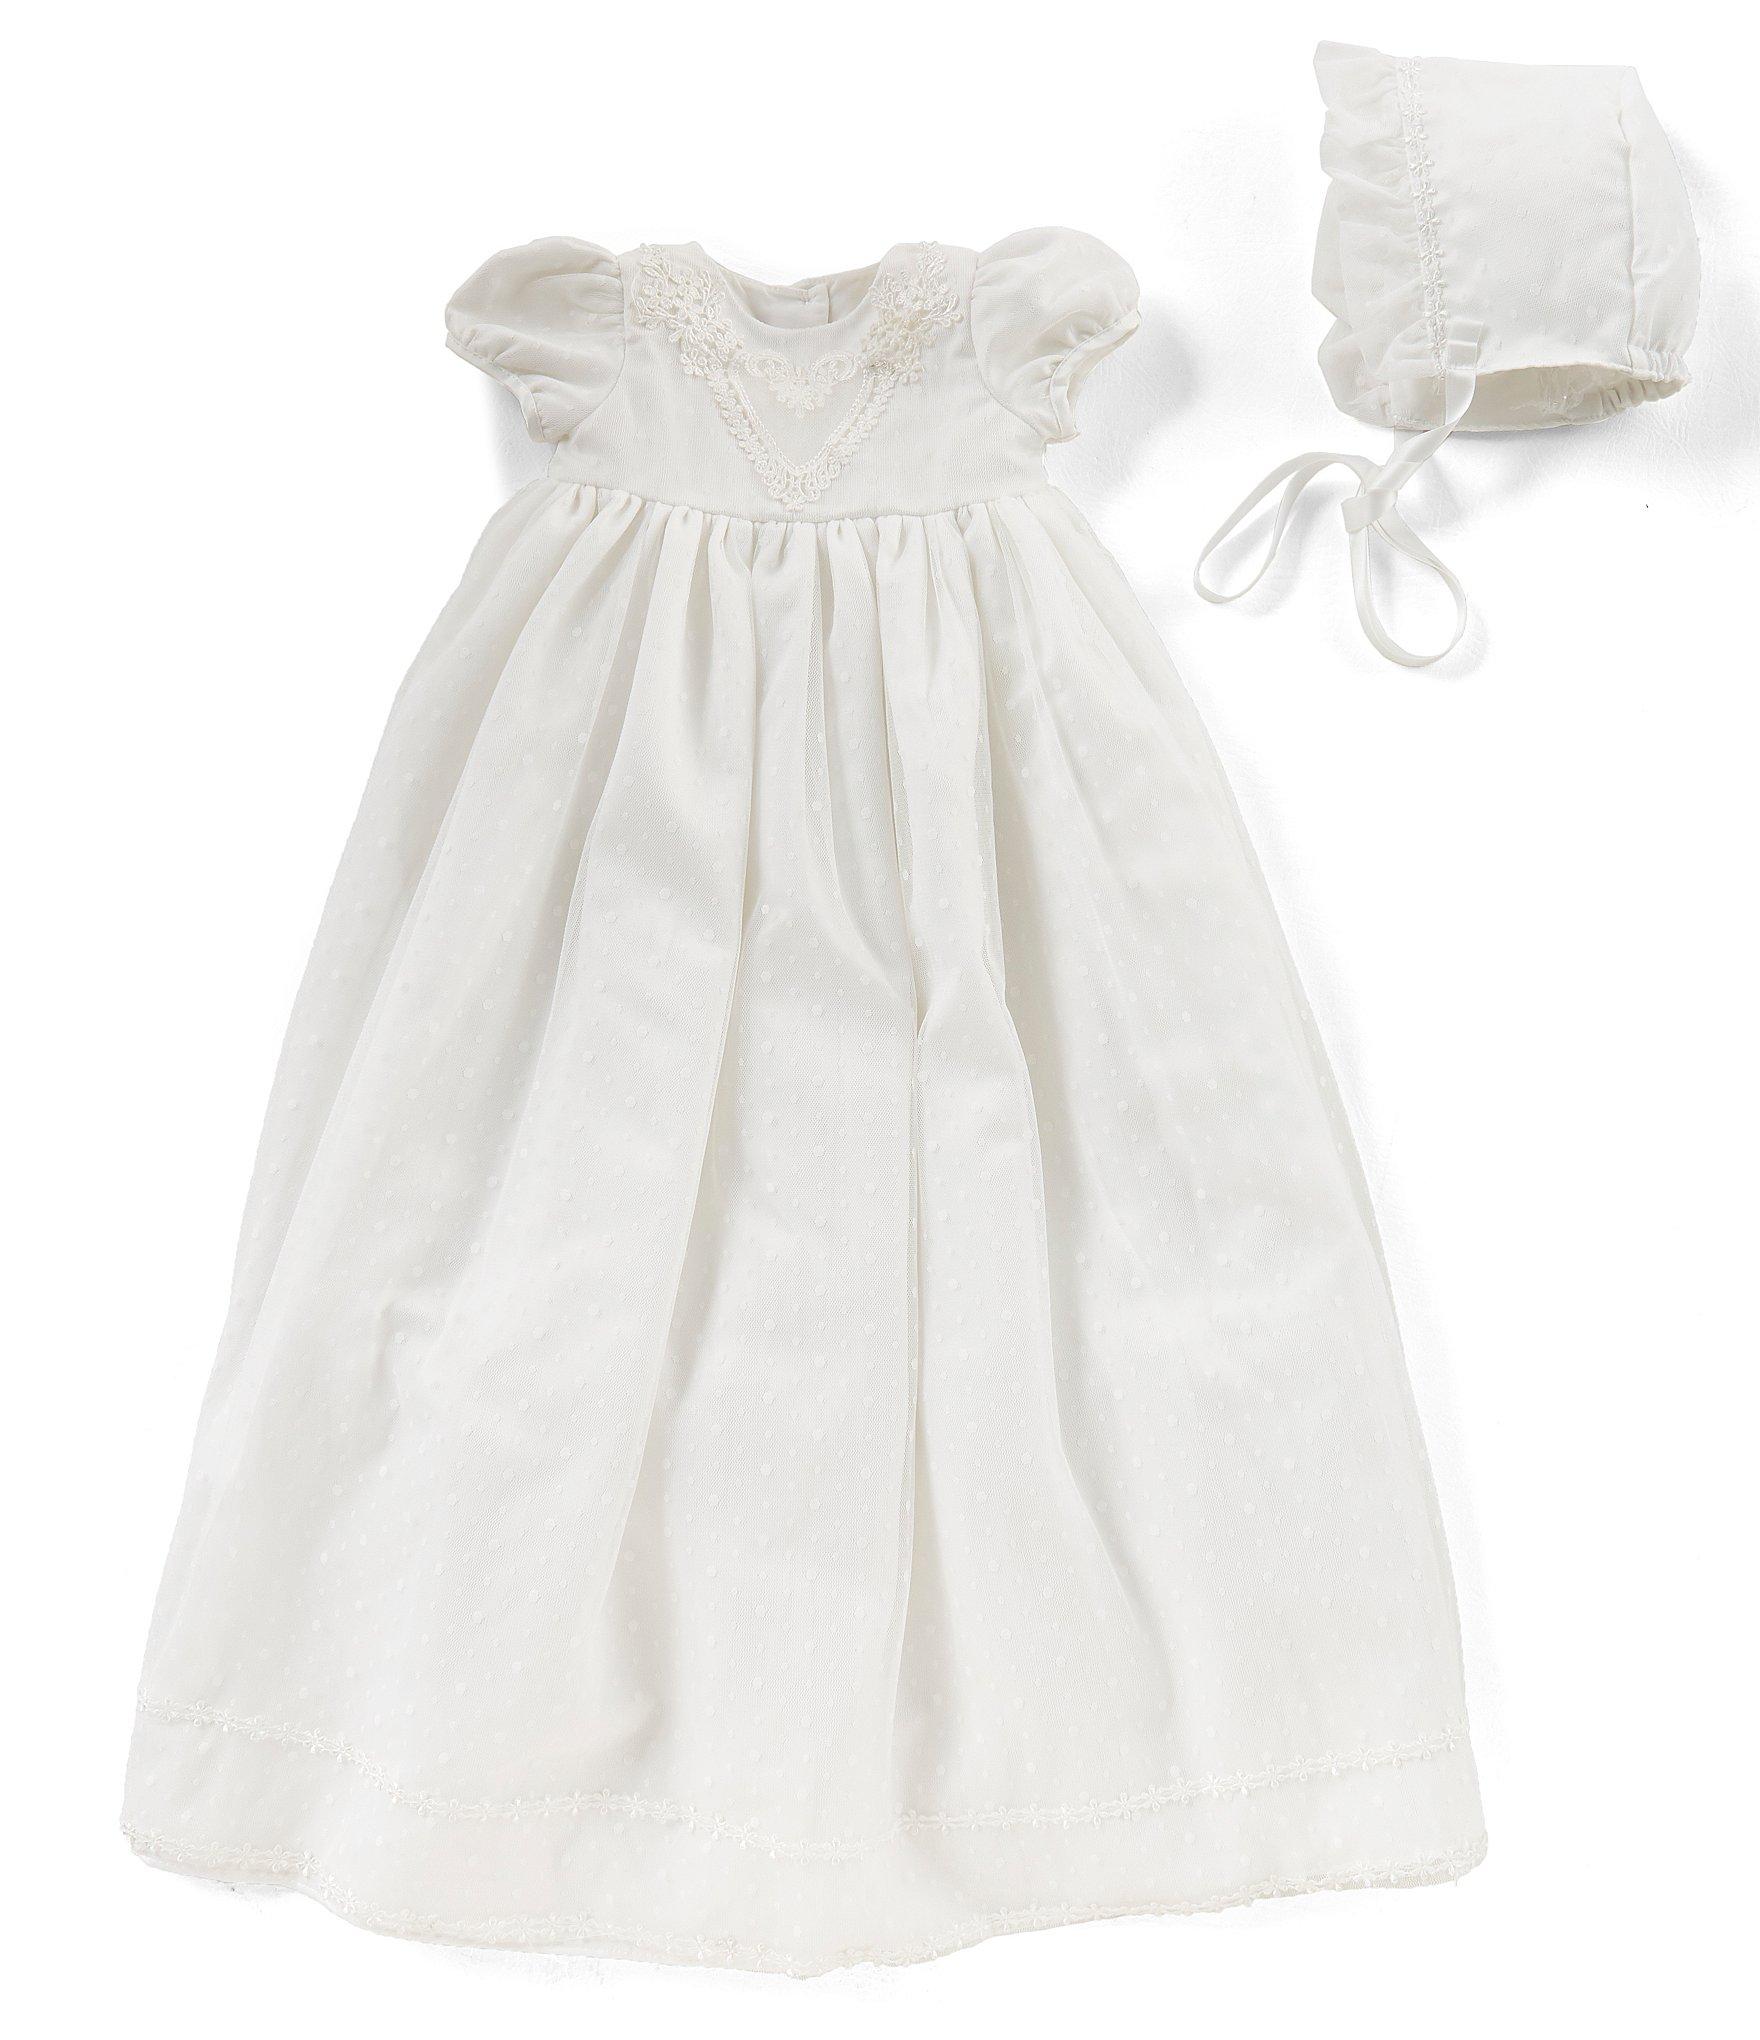 63e6b51c8 Baby Girl Christening Dresses, Gowns & Accessories | Dillard's